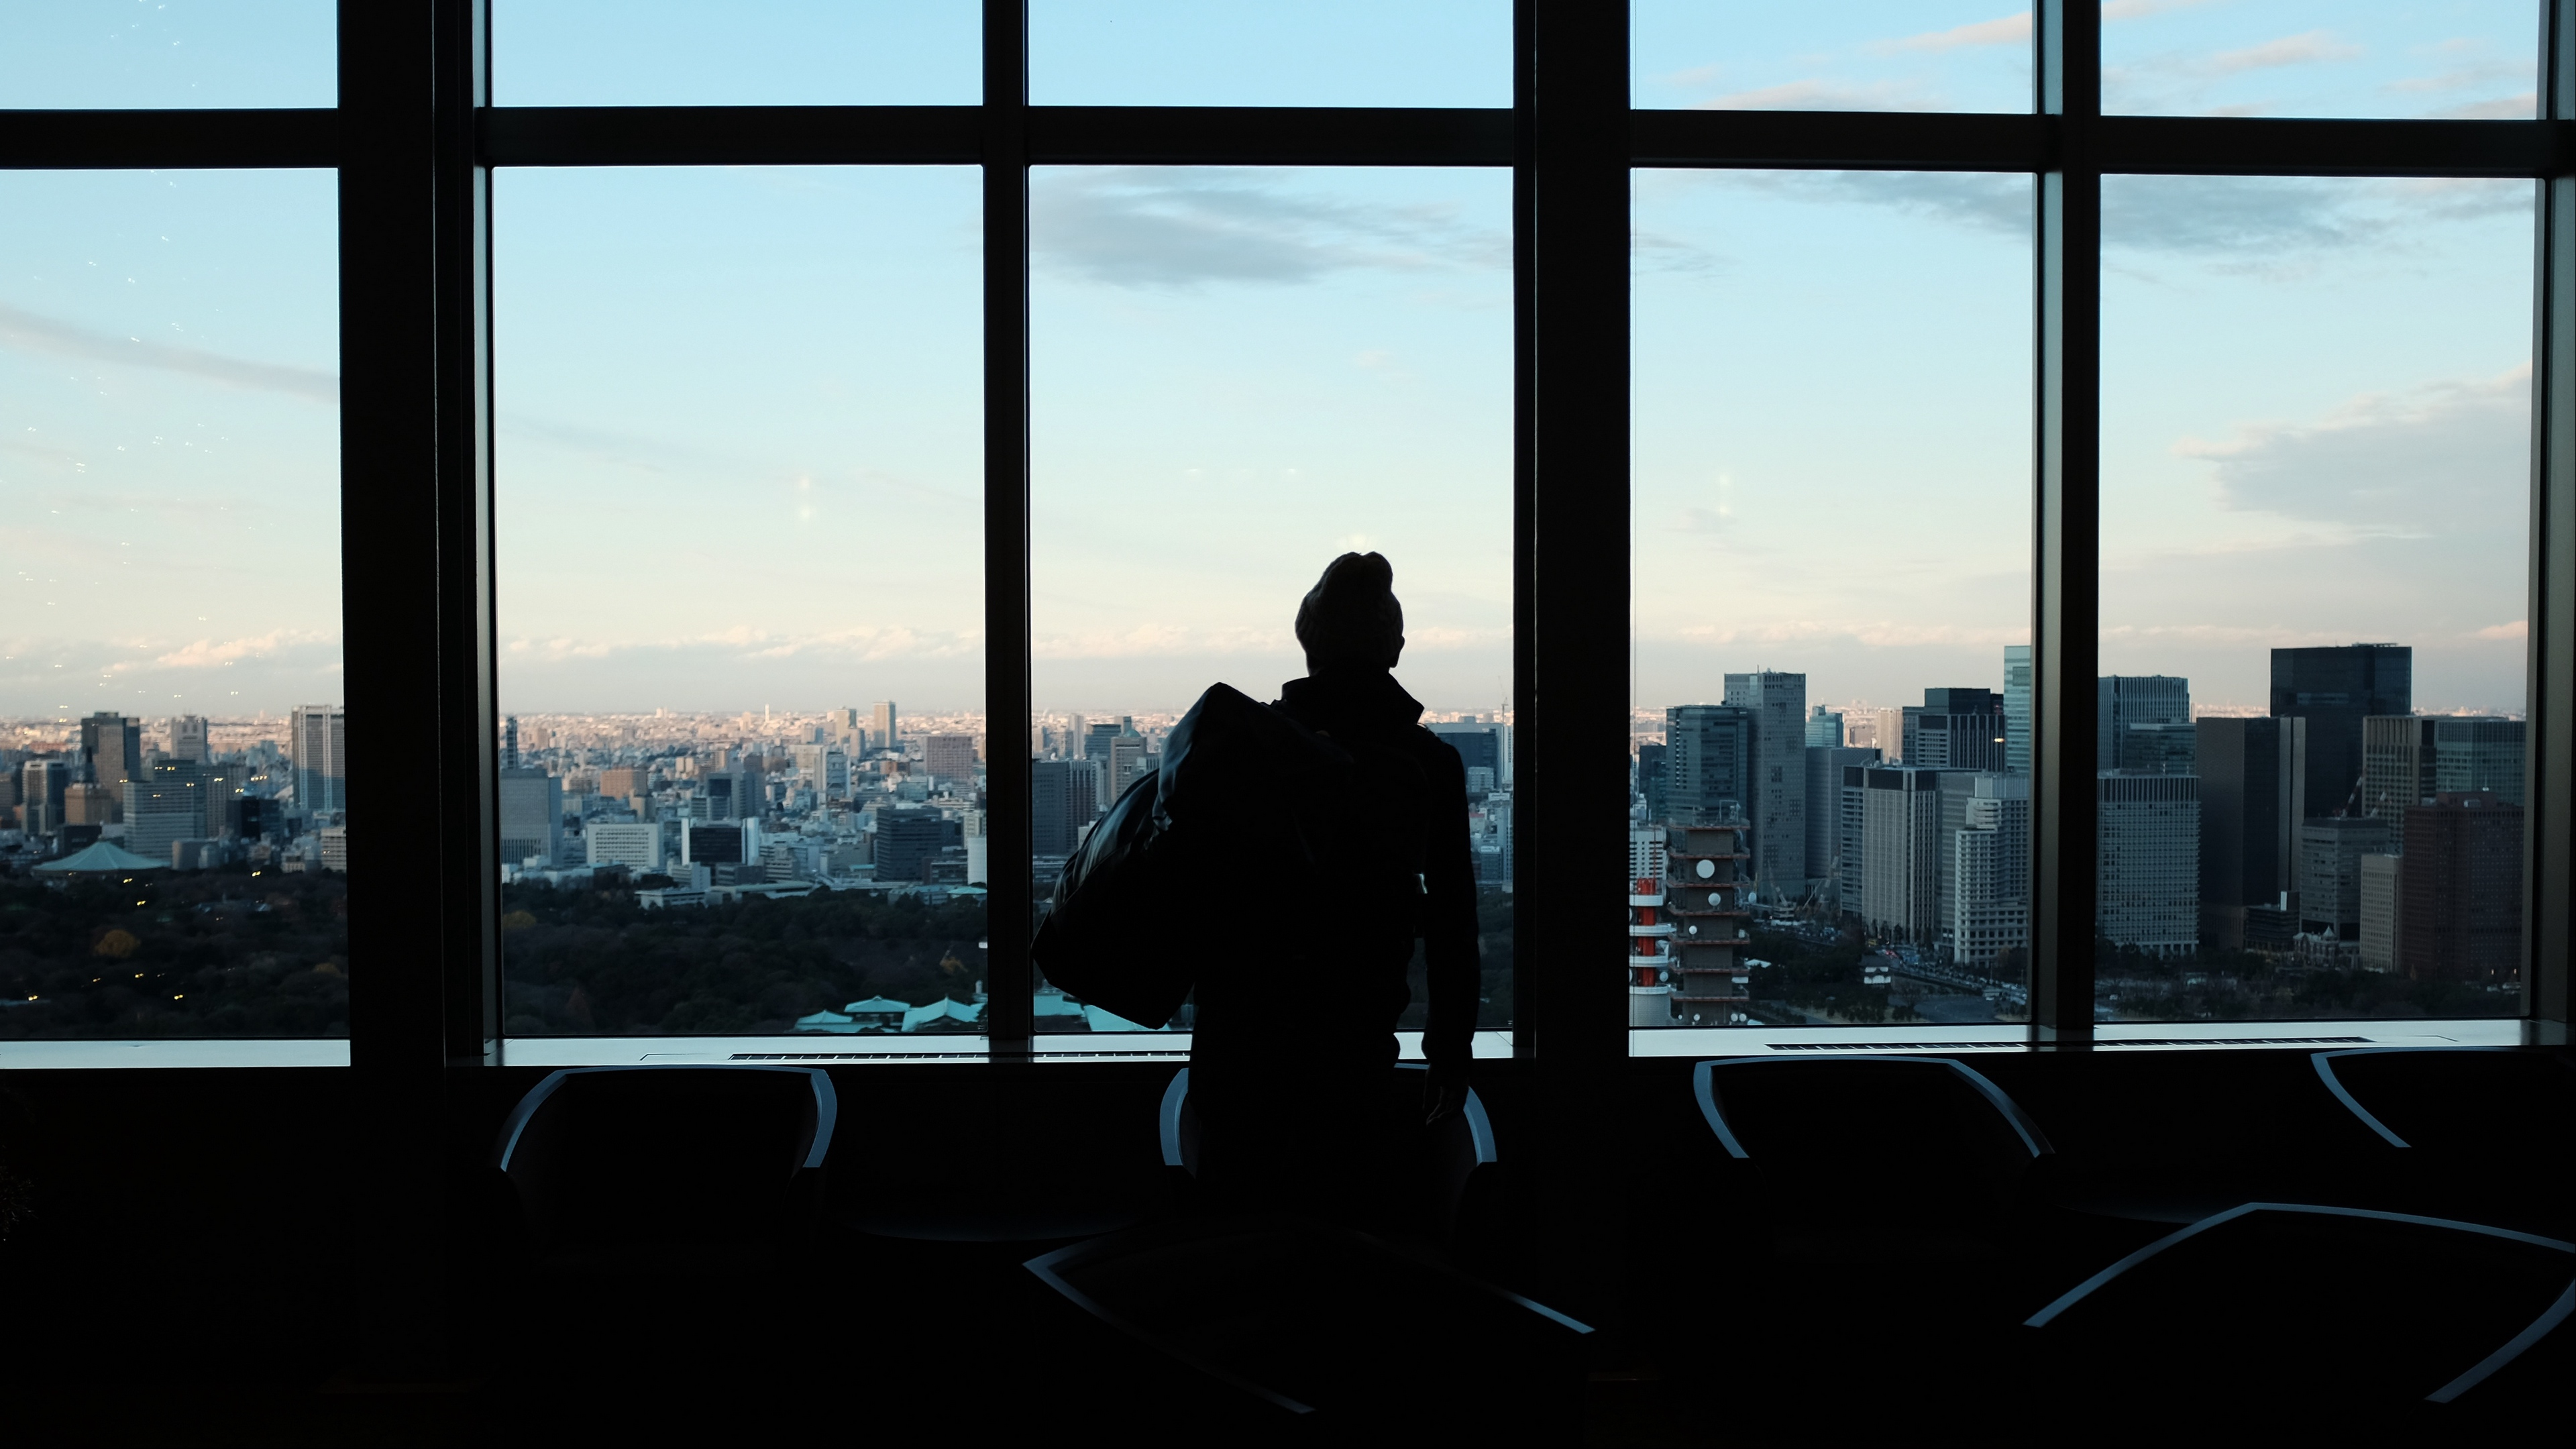 silhouette window city 4k 1540574642 - silhouette, window, city 4k - Window, Silhouette, City